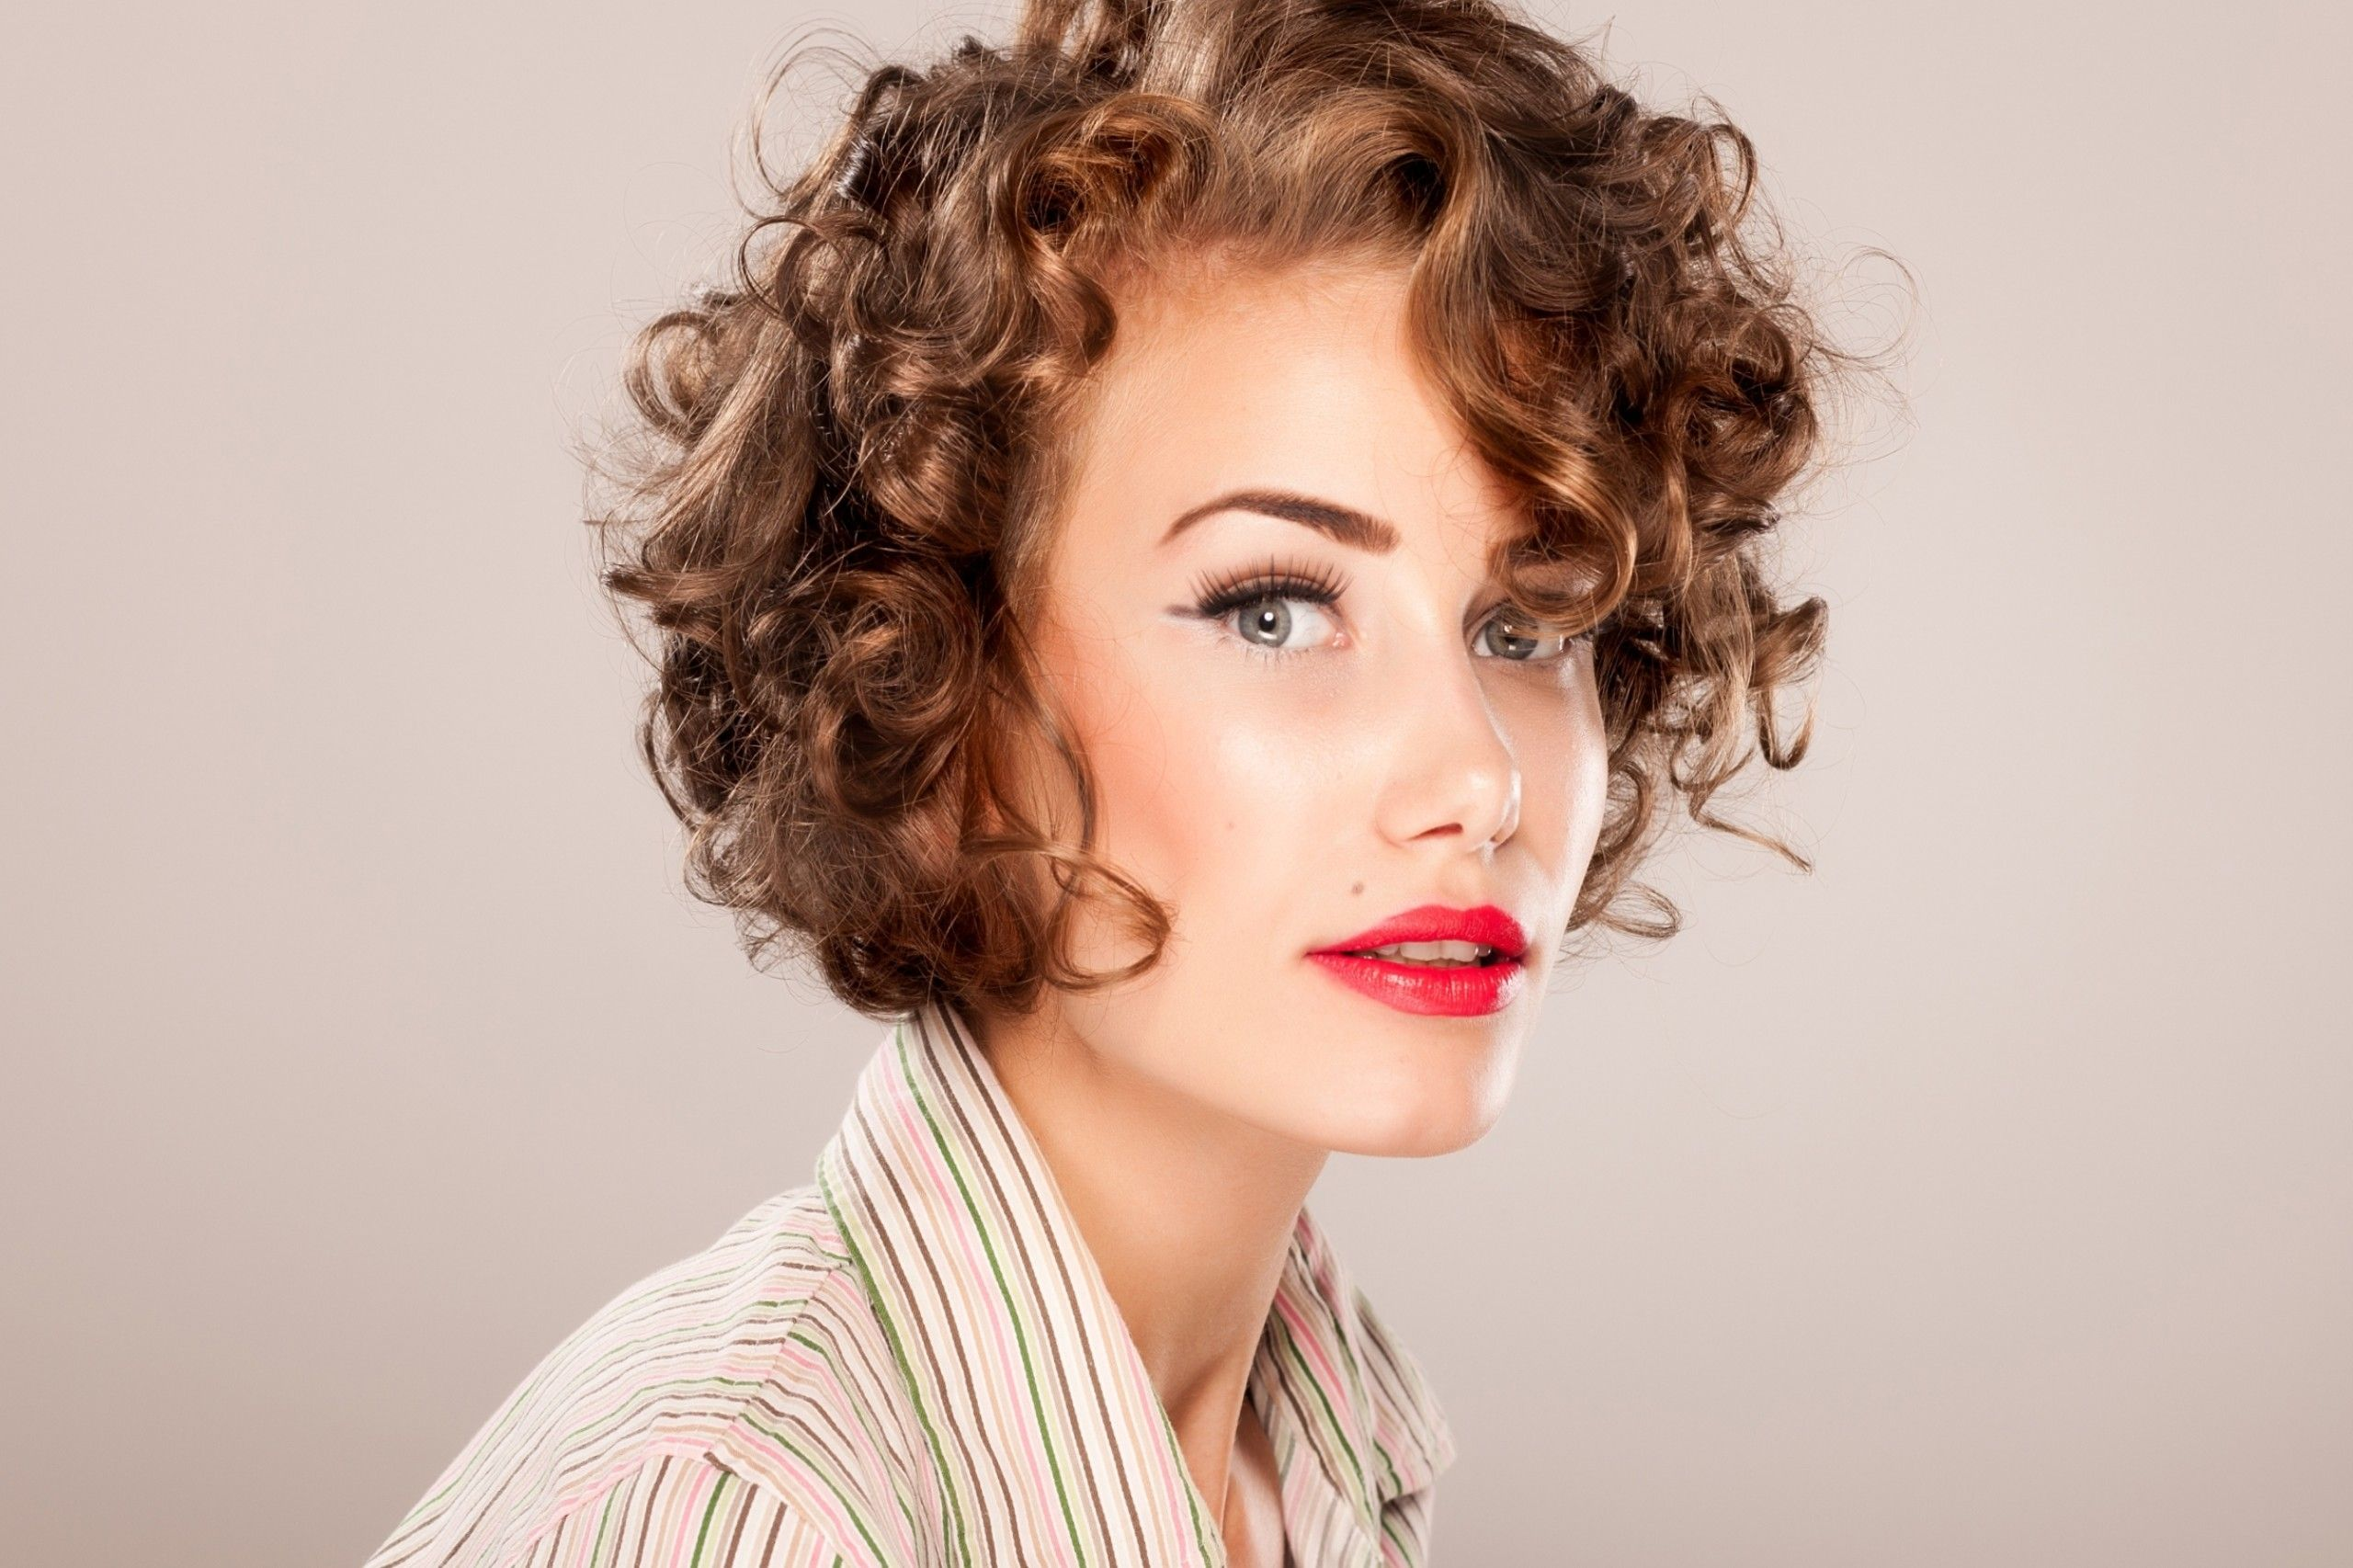 best short curly hairstyles 2018 - best short hairstyles | short